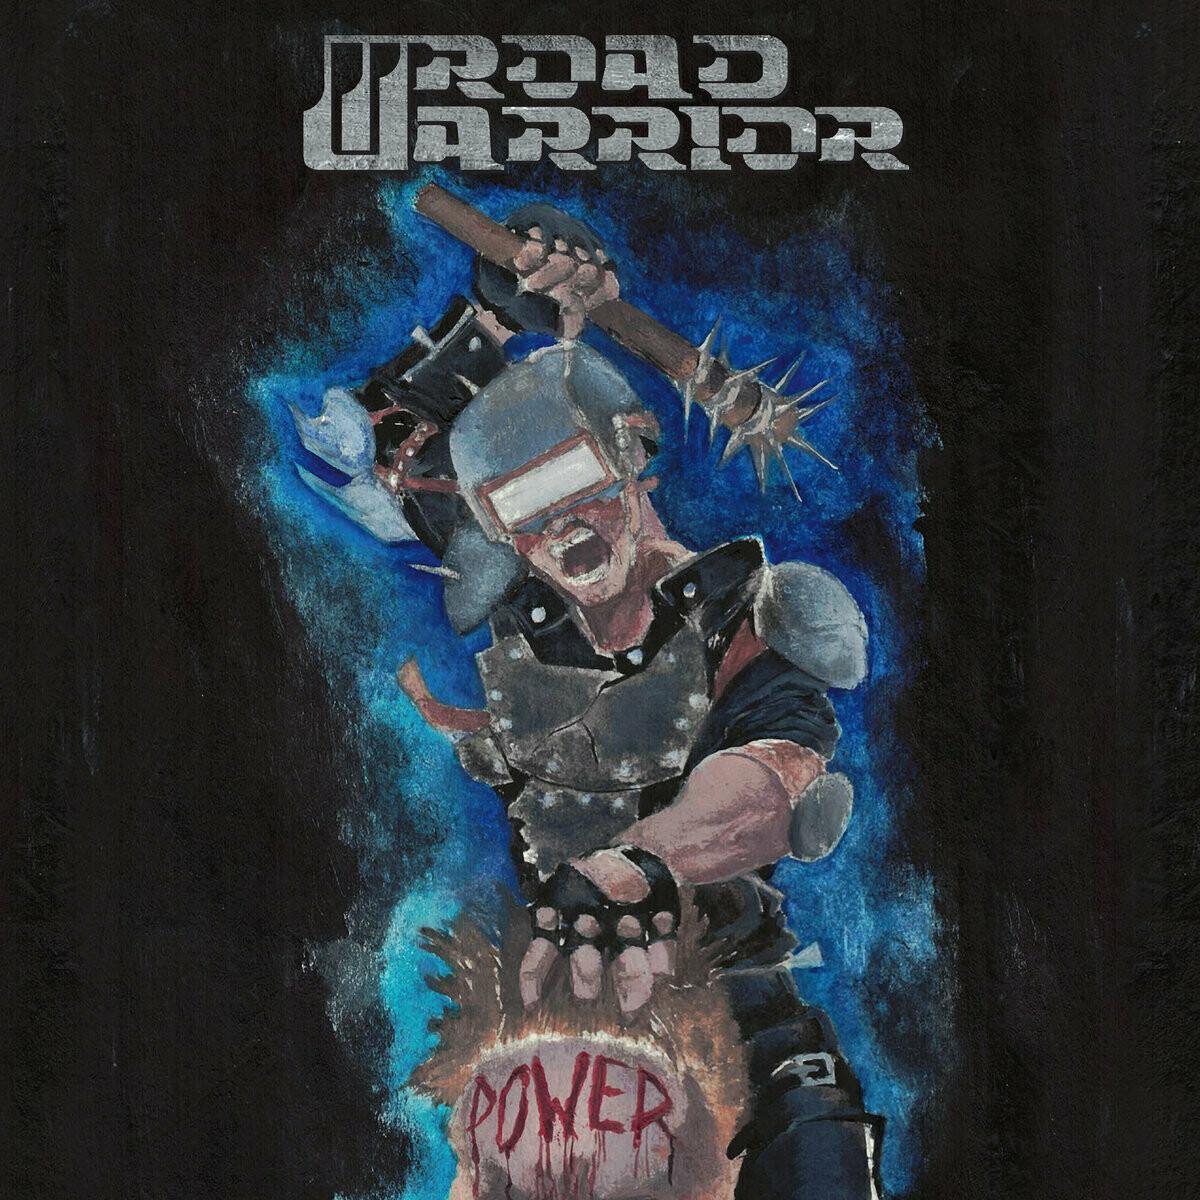 Road Warrior - Power